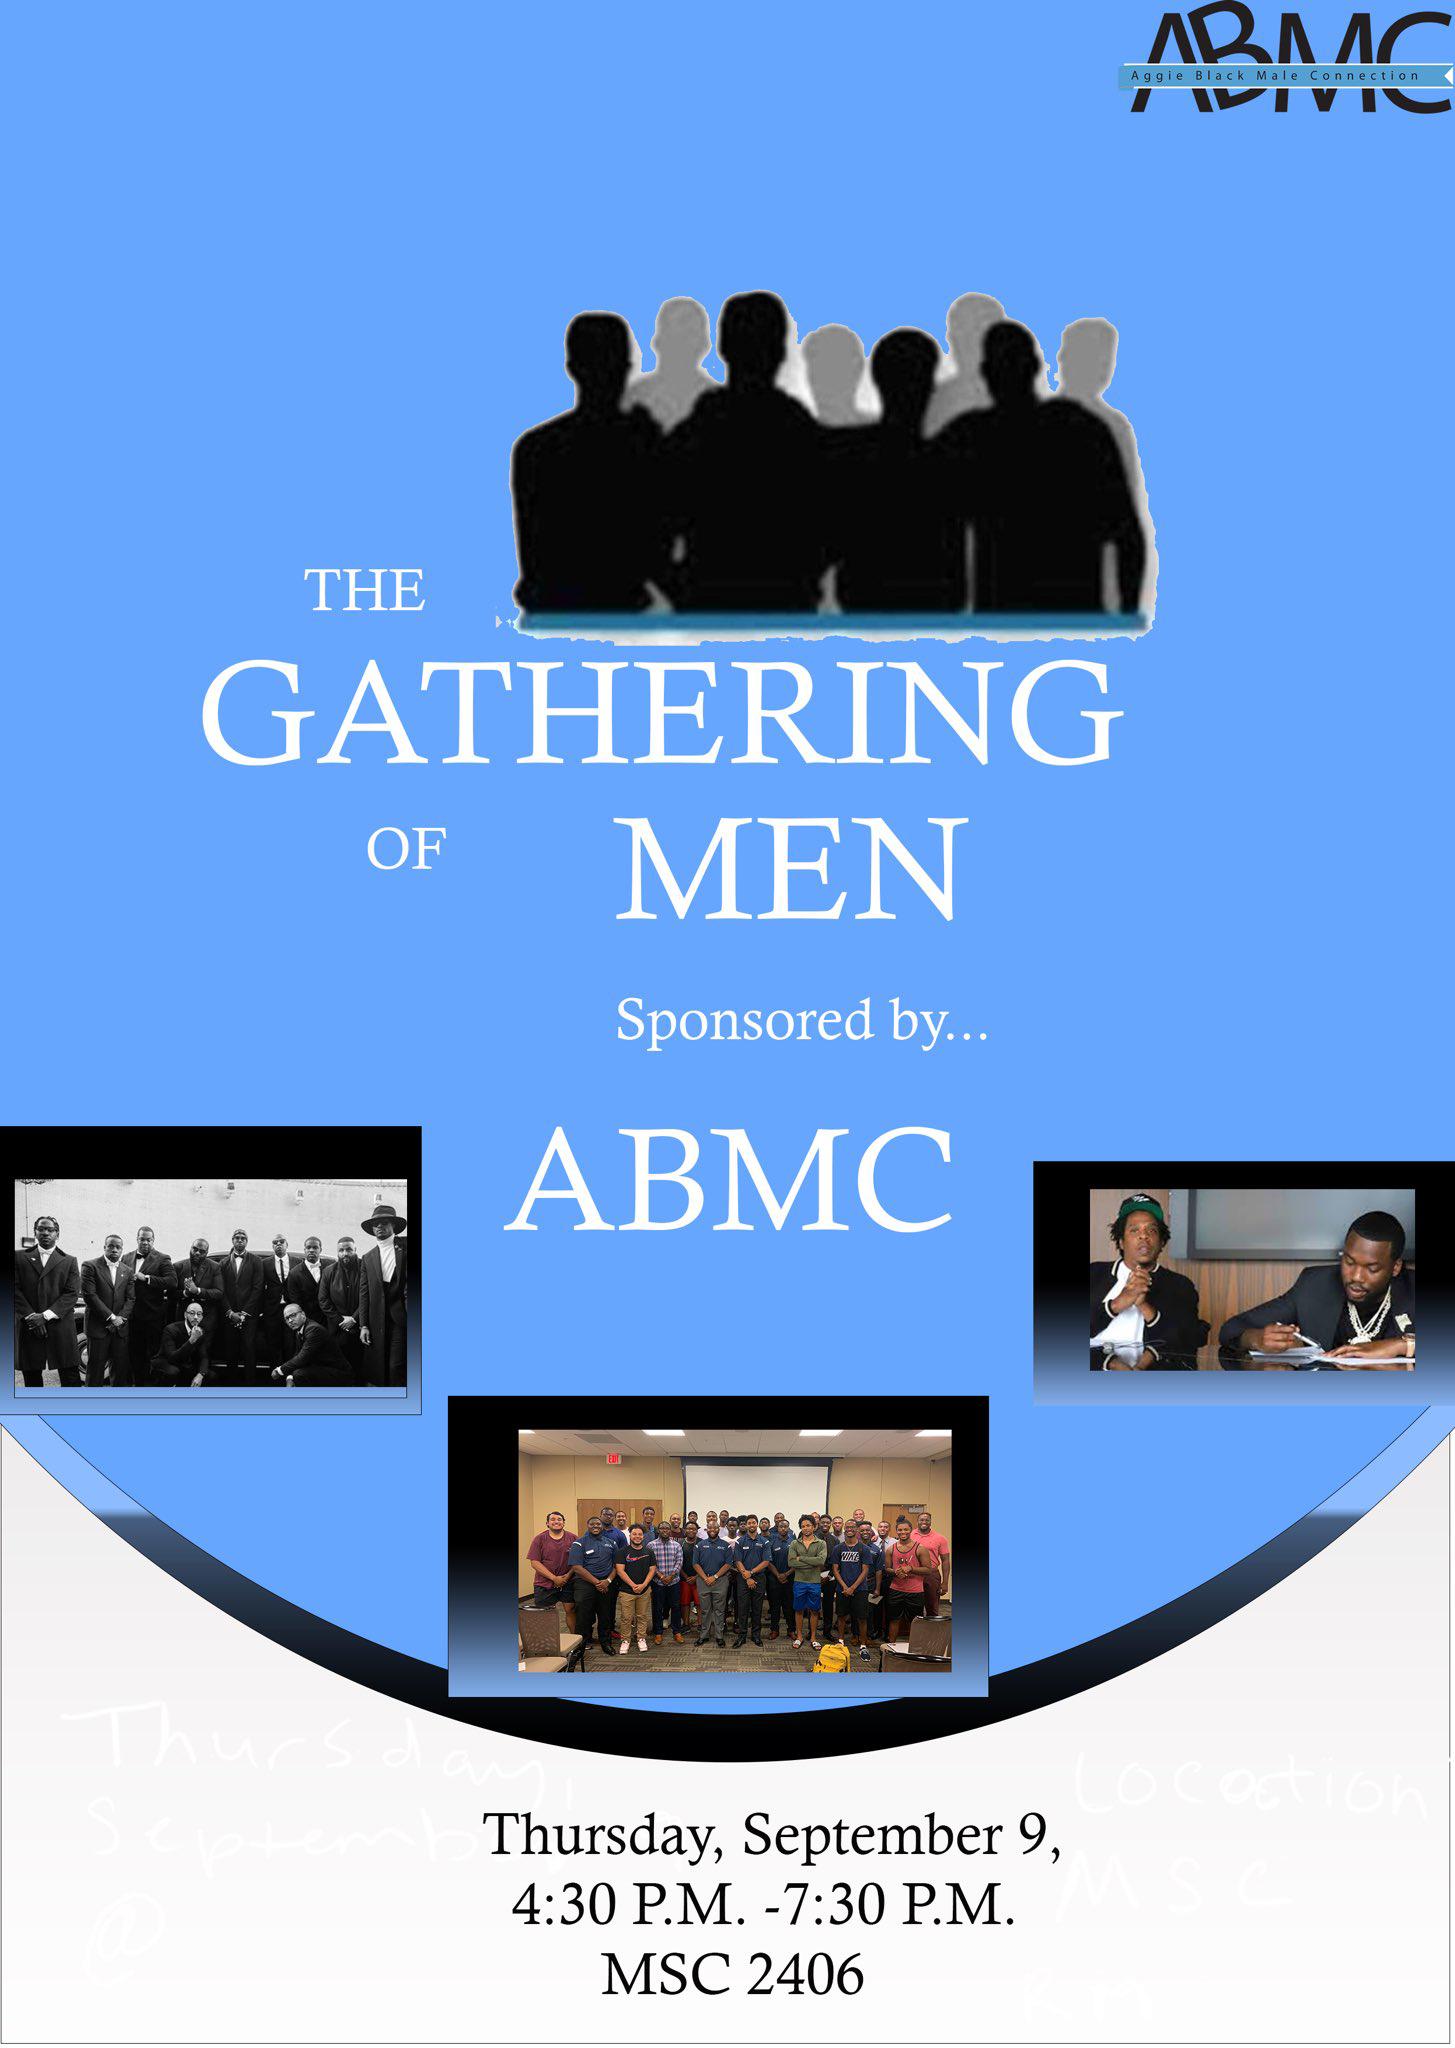 The Gathering of Men